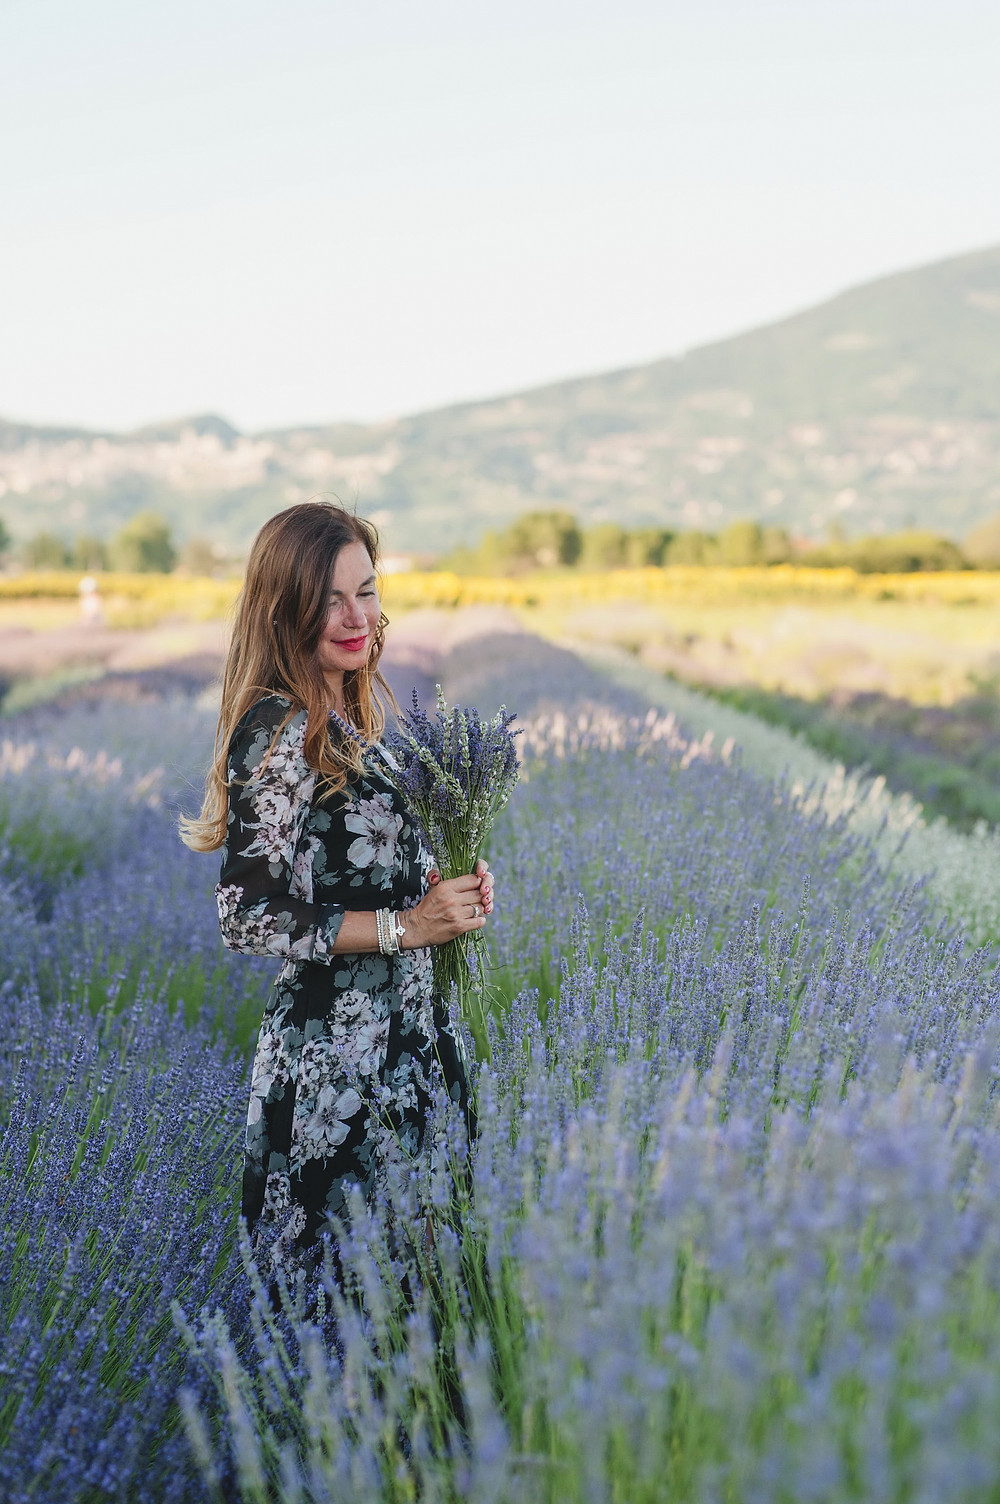 photo shoot in Italy, фотосессия в Италии